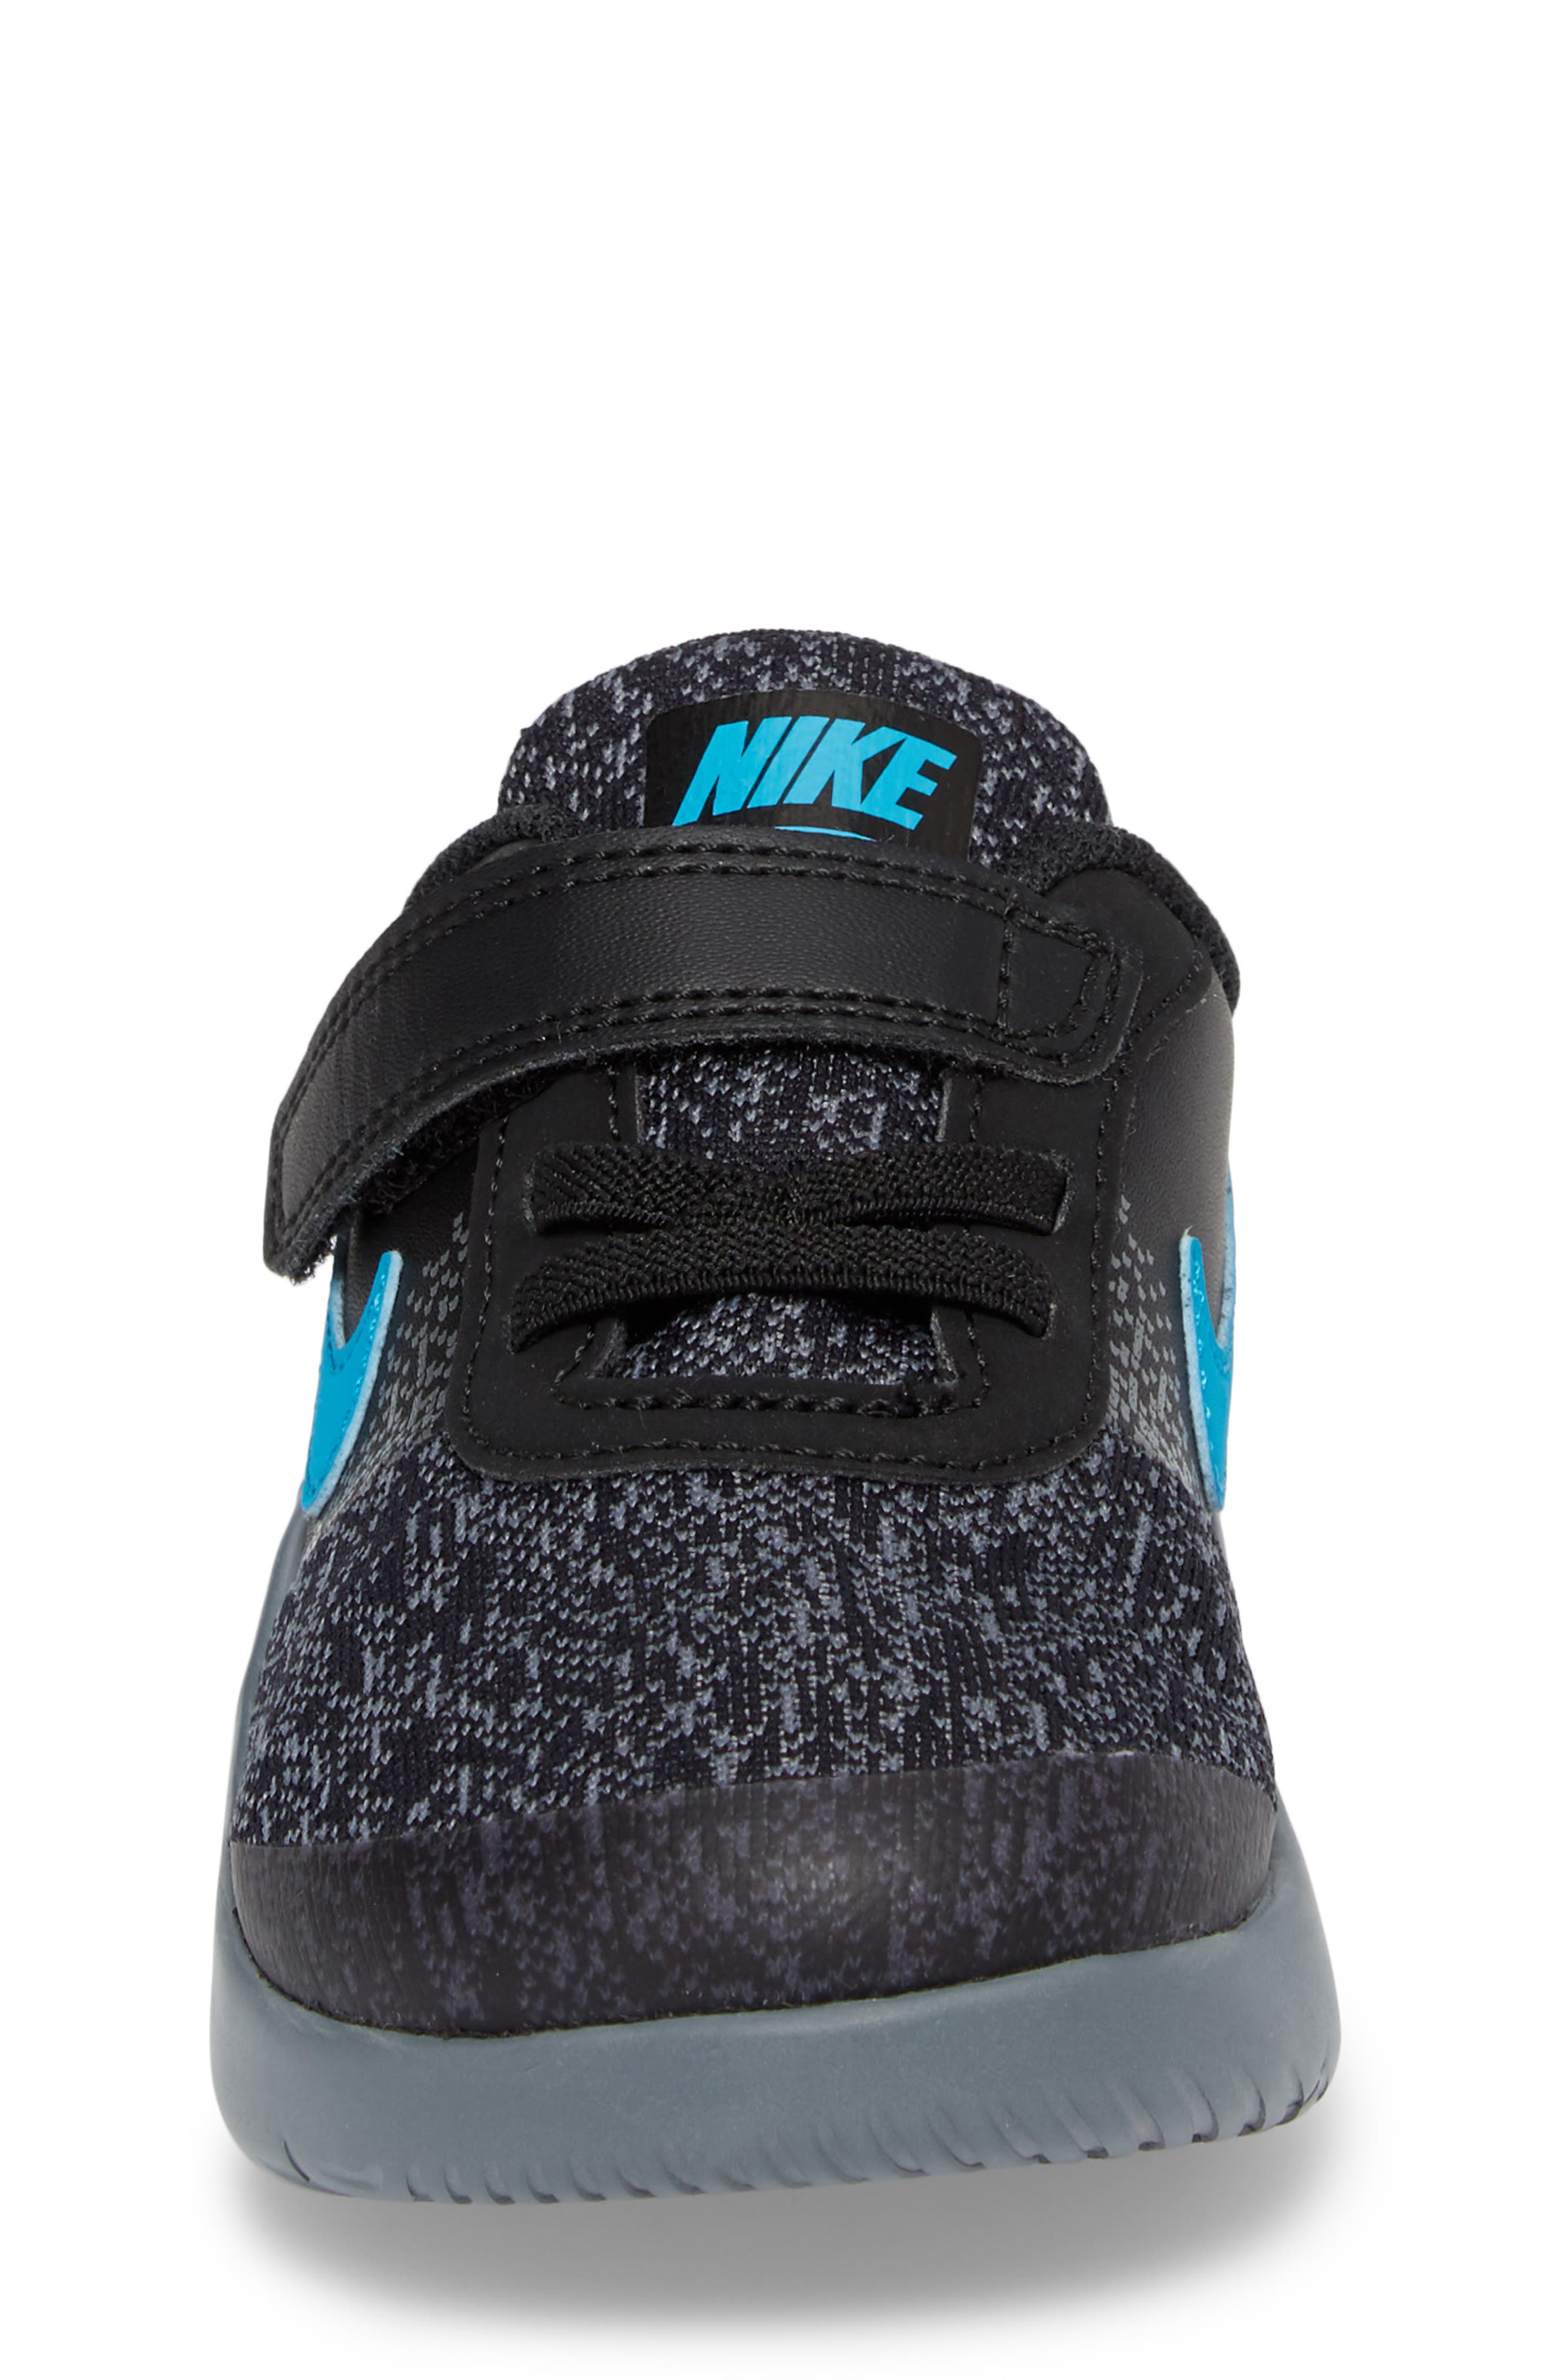 Alternate Image 4  - Nike Flex Contact Running Shoe (Baby, Walker, Toddler & Little Kid)